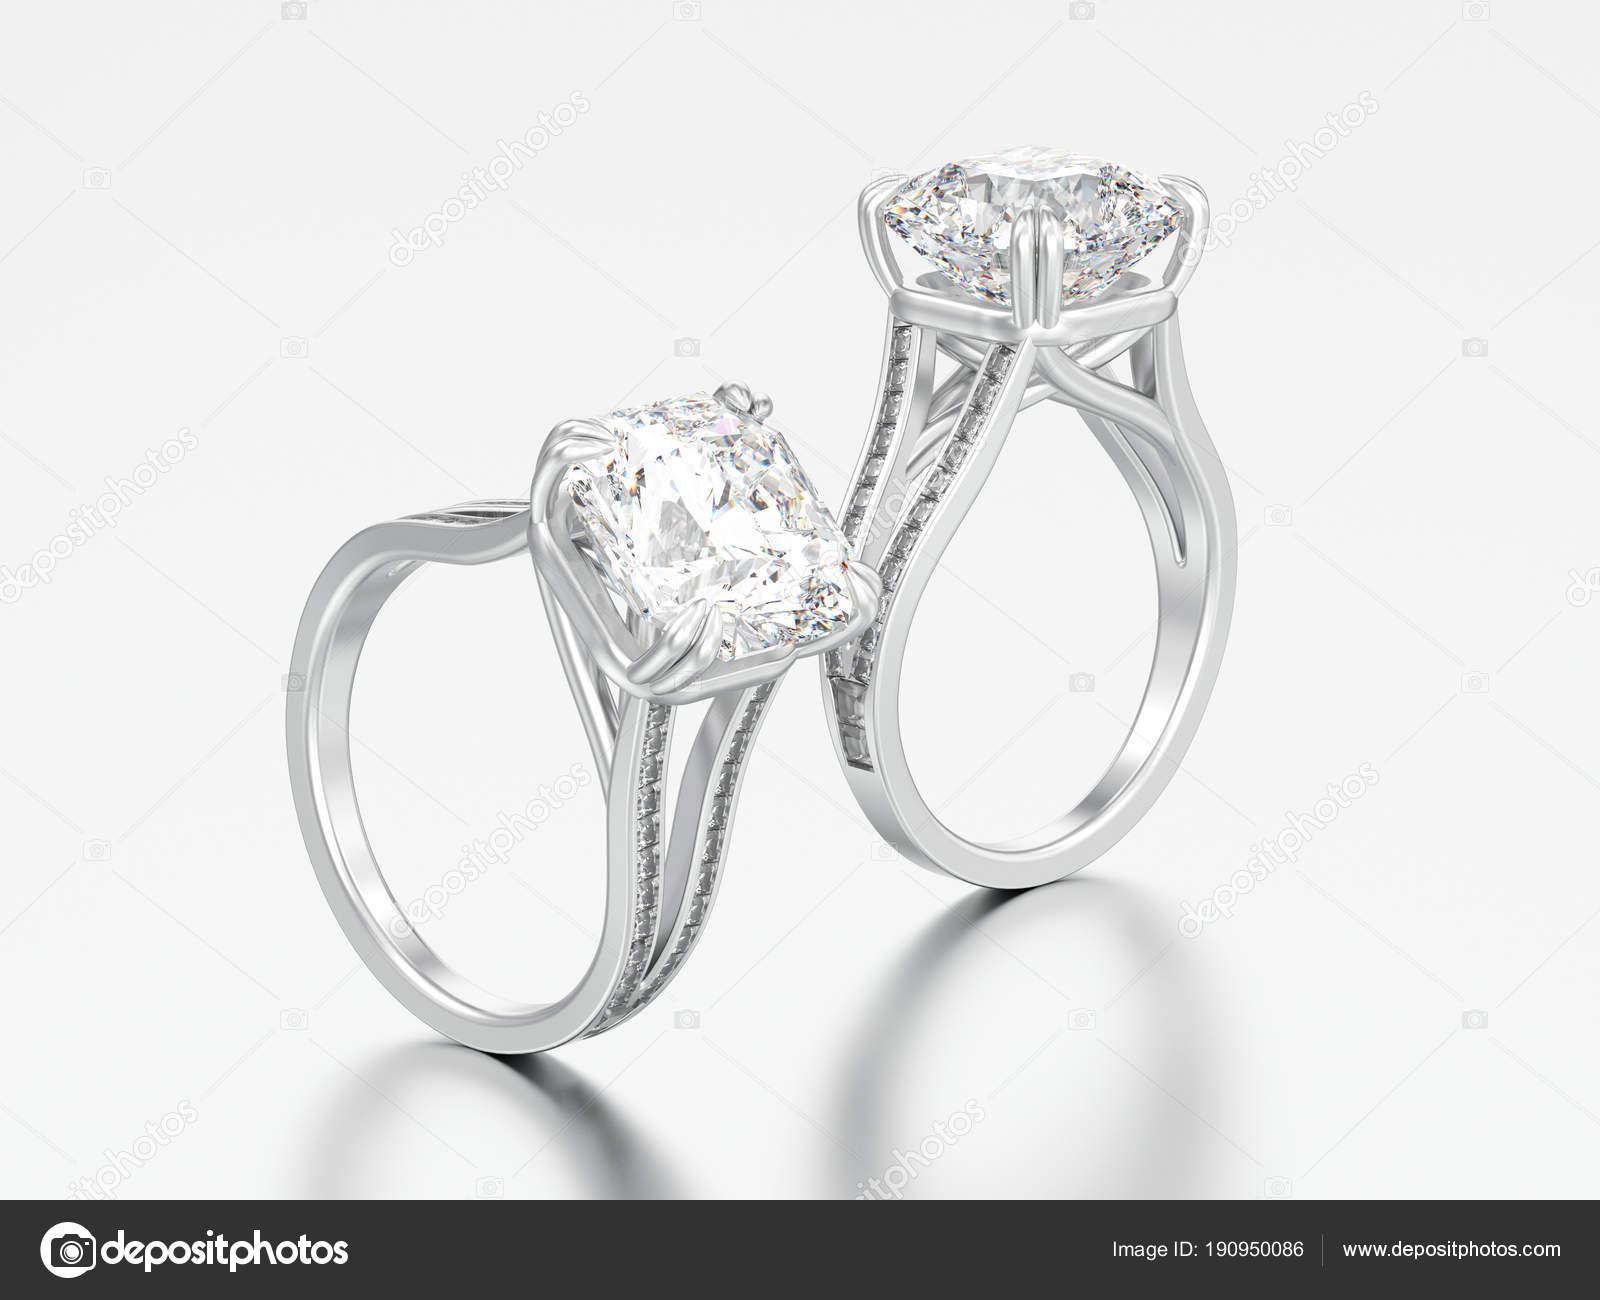 3d Abbildung Zwei Weisse Gold Oder Silber Diamant Verlobungsring